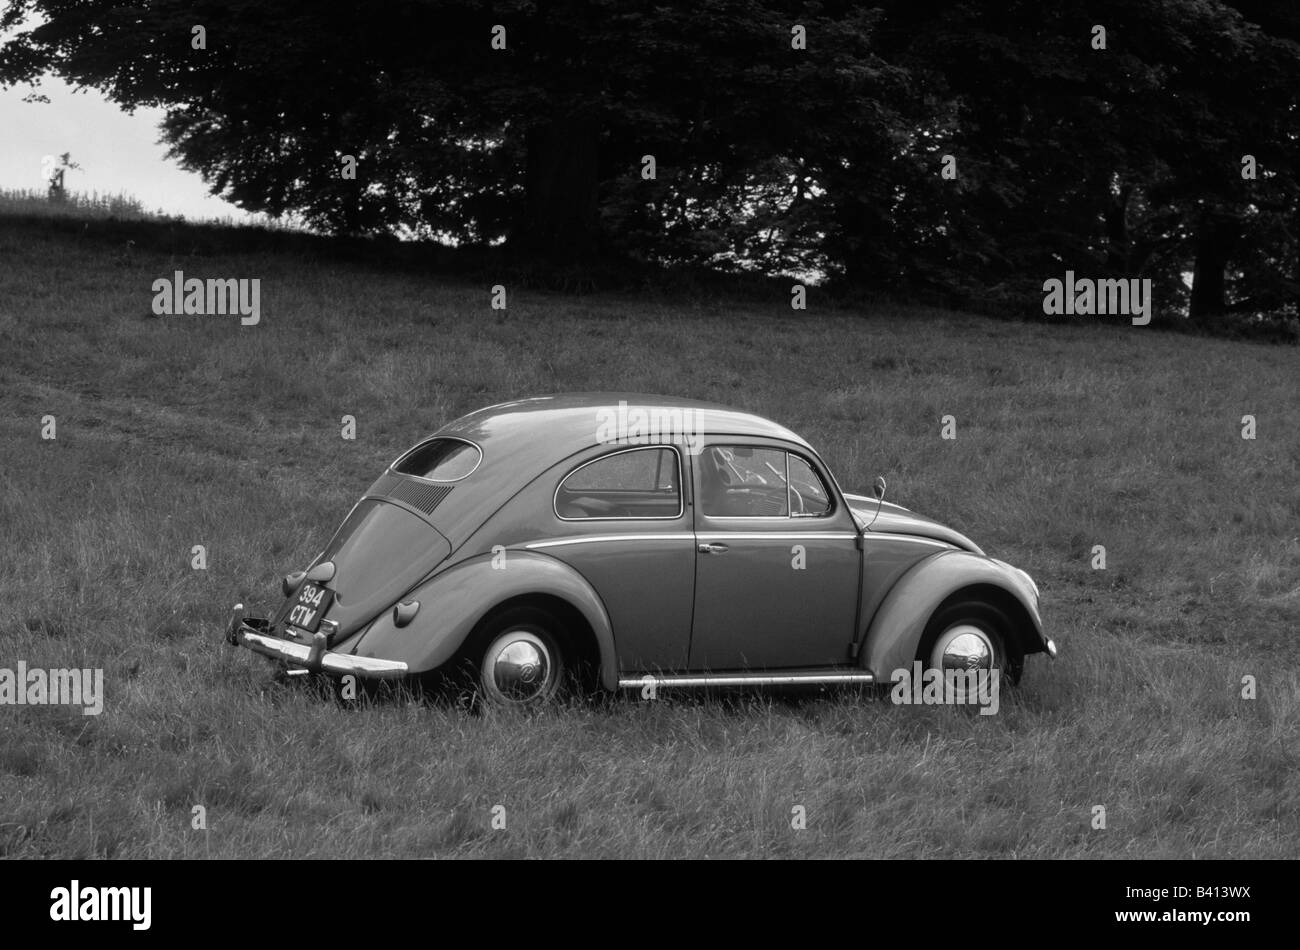 Volkswagen Beetle 1200 of 1955. car auto classic retro - Stock Image